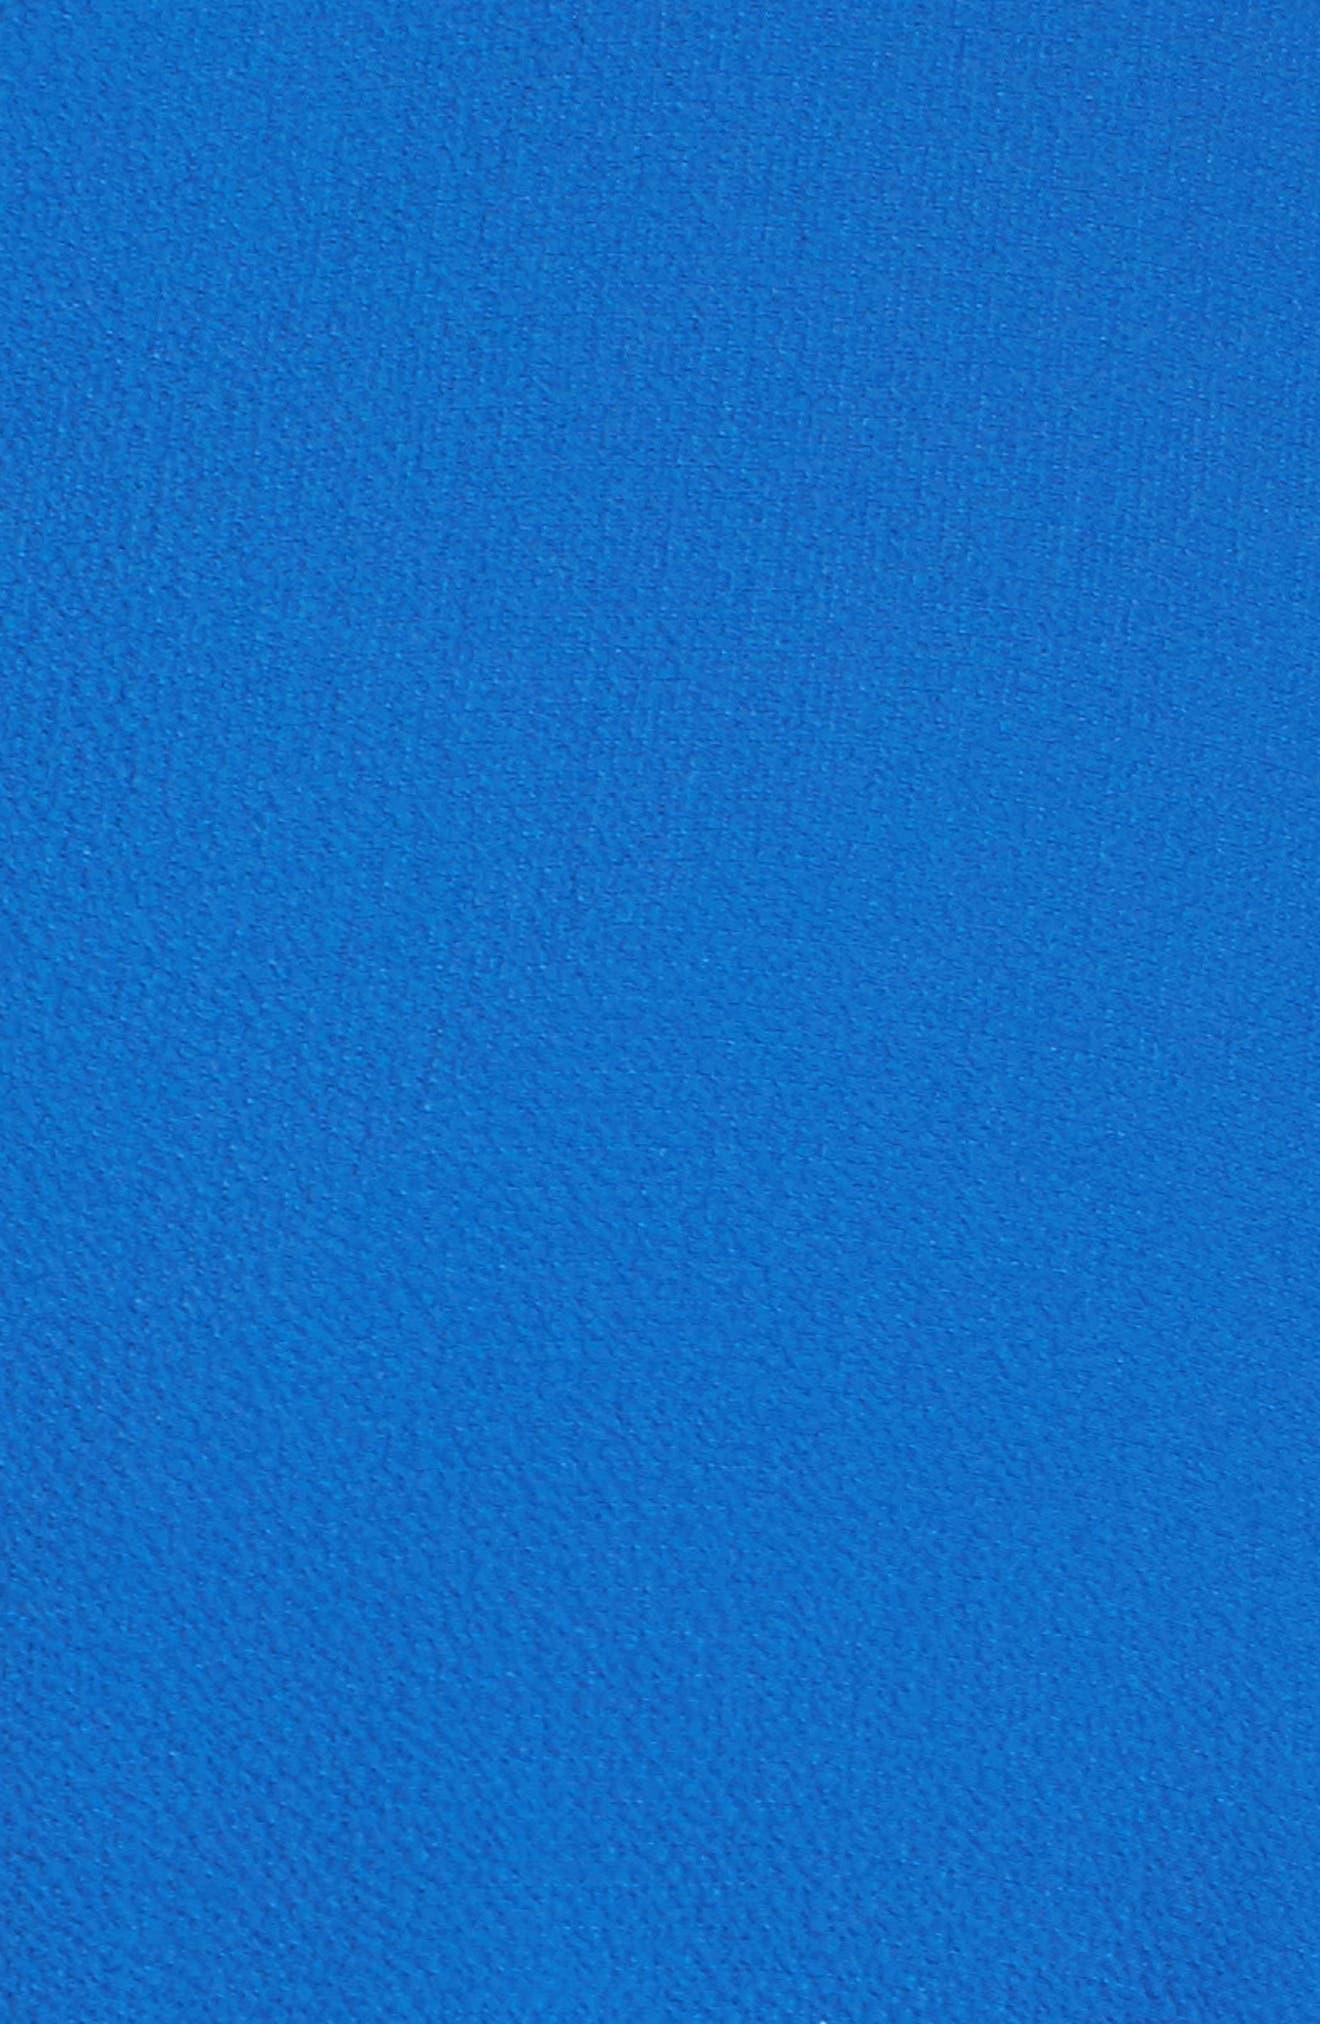 Lace-Up Handkerchief Top,                             Alternate thumbnail 5, color,                             487